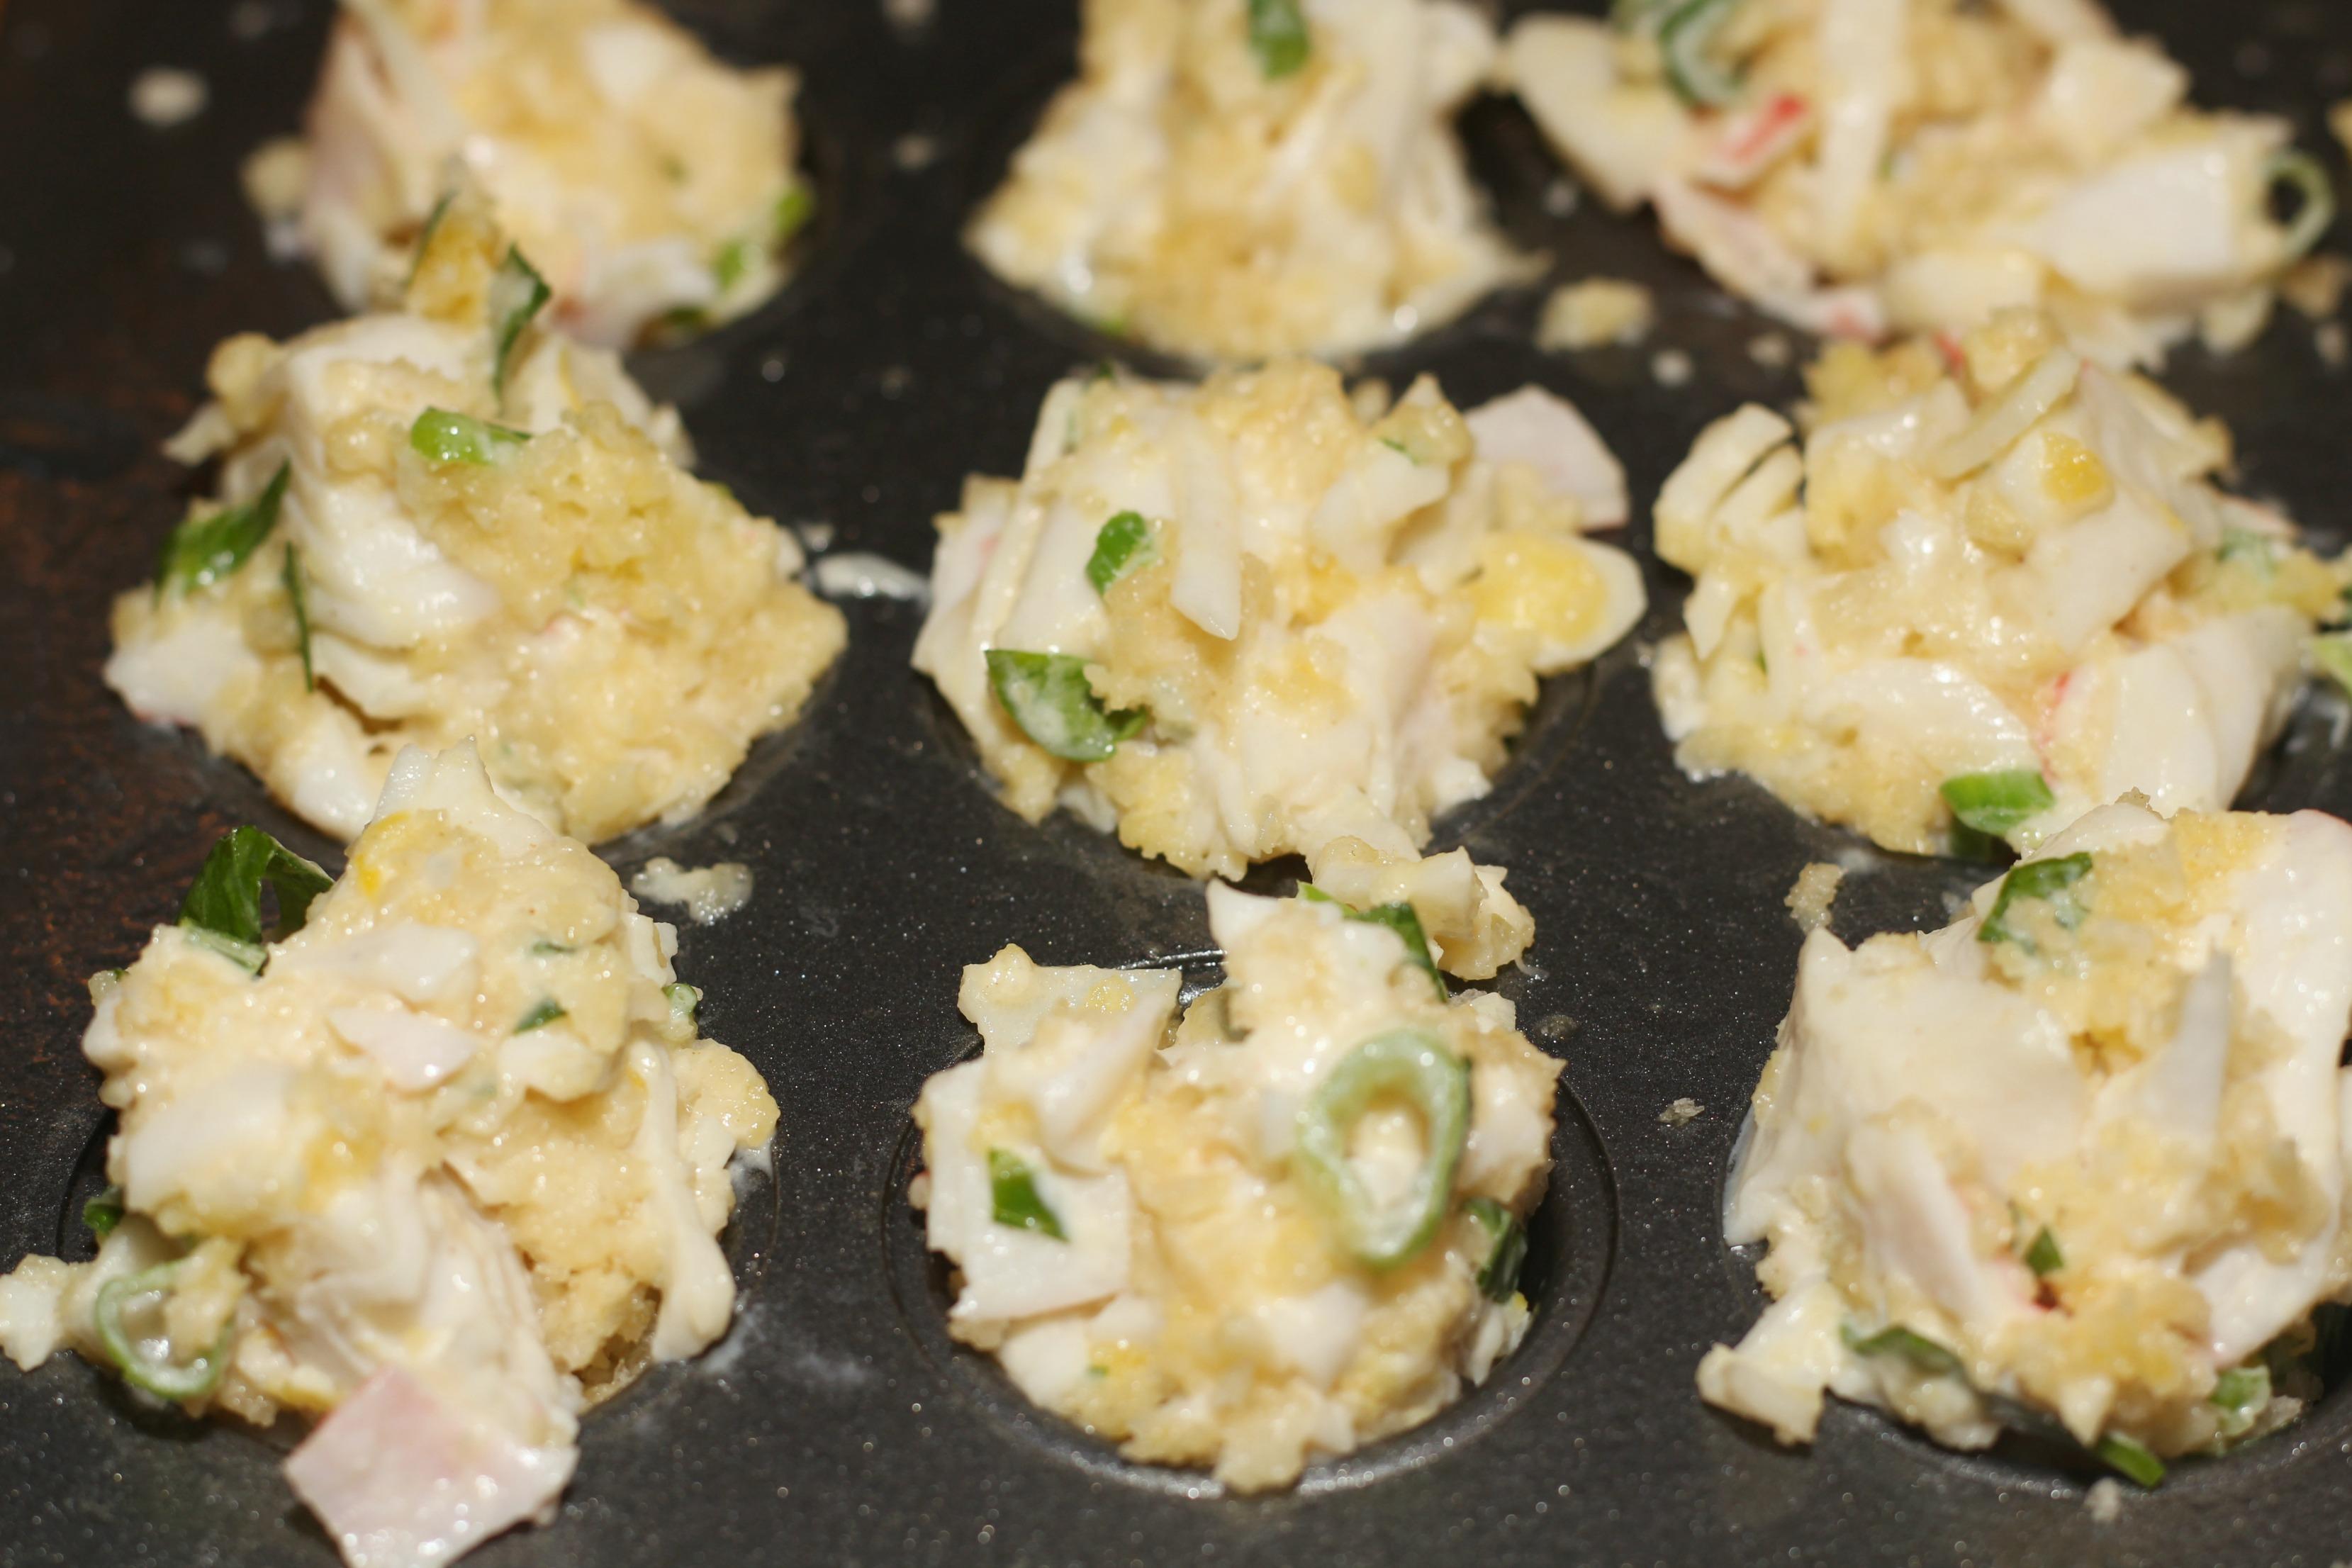 Crab Cake Bites with Sriracha Aioli